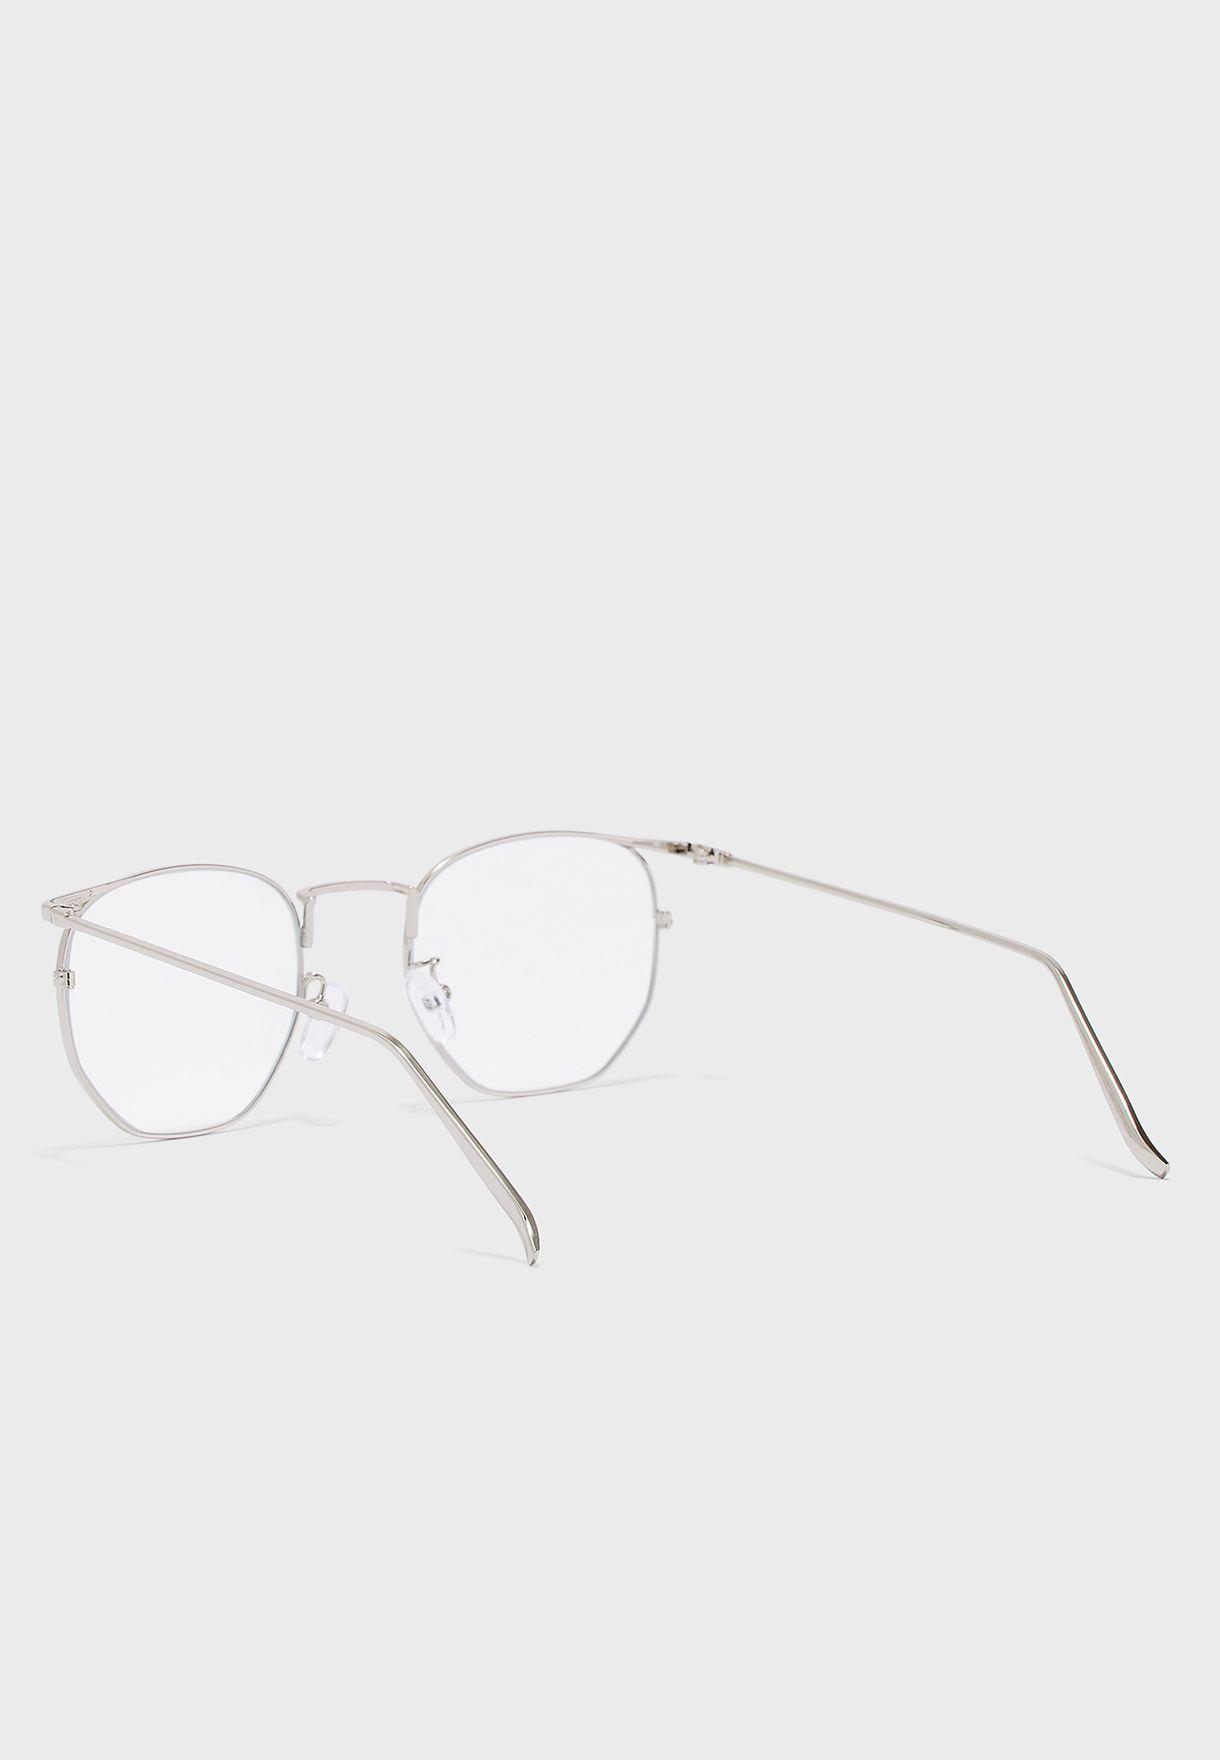 Clear Lens Optical Glasses